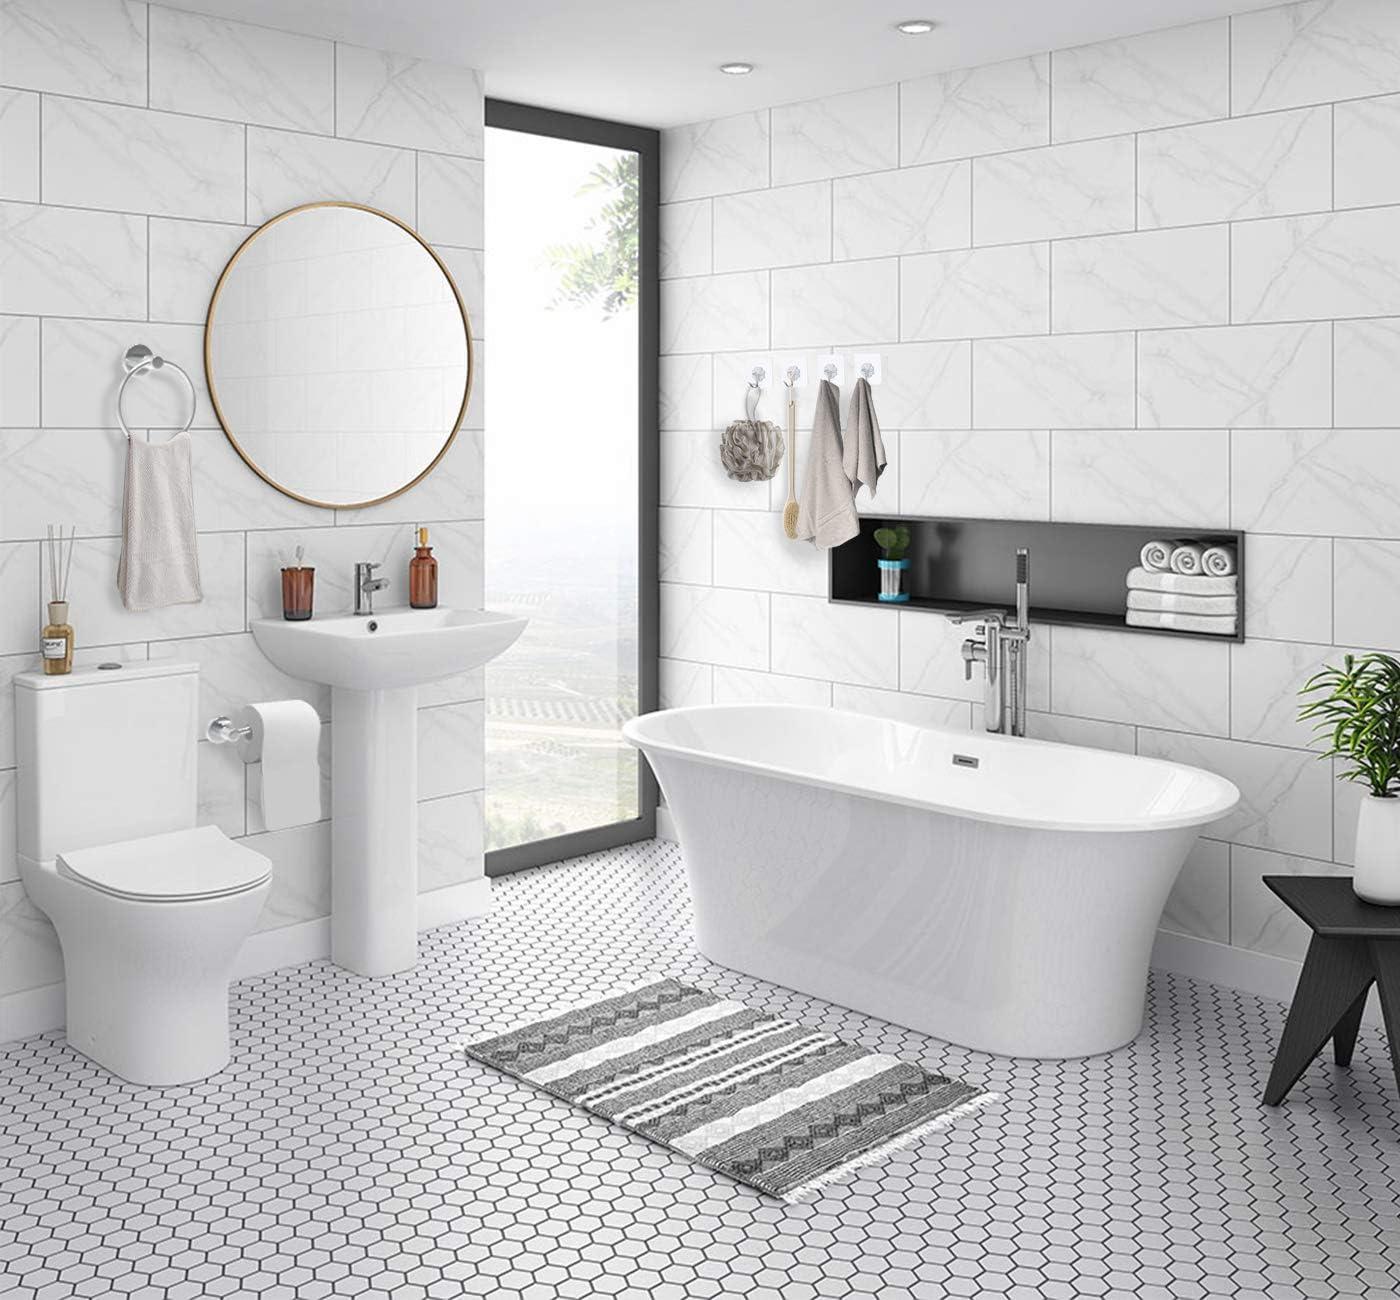 Bathroom Toilet Paper Holder & Towel Holder, Hand Towel Holder for  Bathroom, Chrome Toilet Paper Holder, Bathroom Accessories Set  Chrome